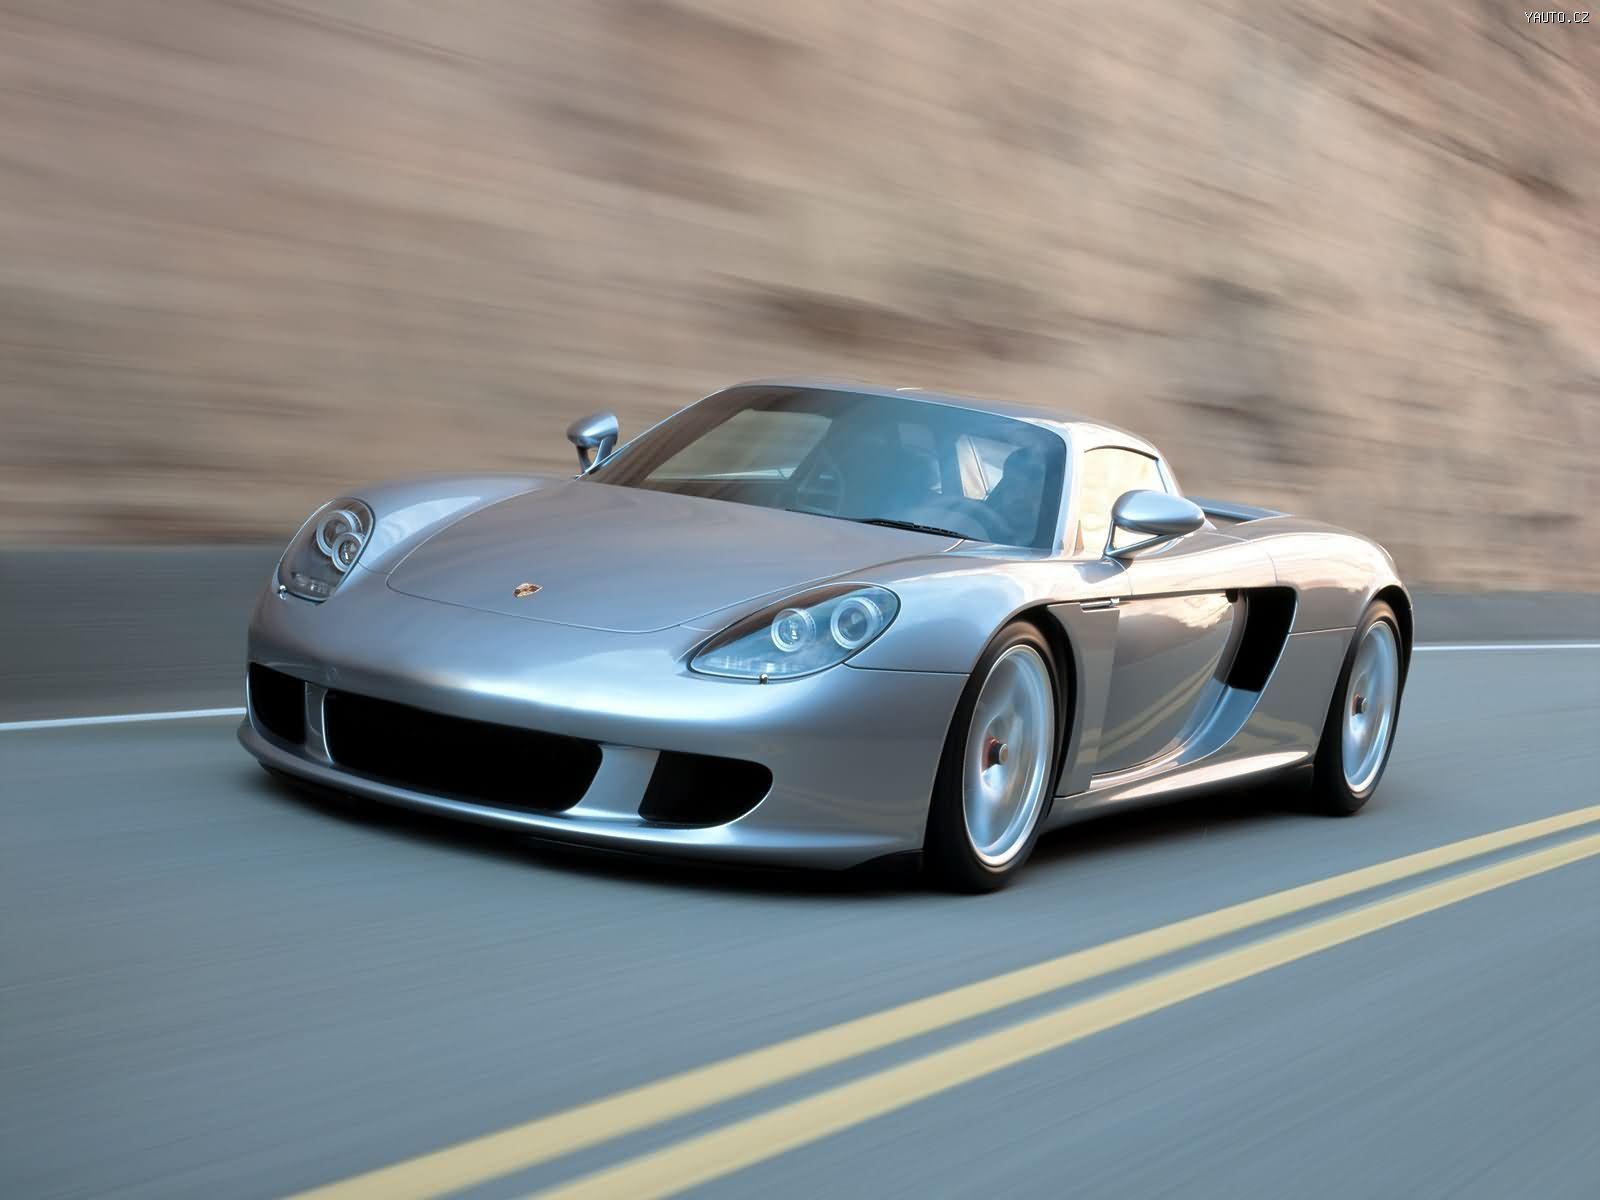 http://img.yauto.cz/tapety/Porsche_Carrera_GT_2004_5.jpg